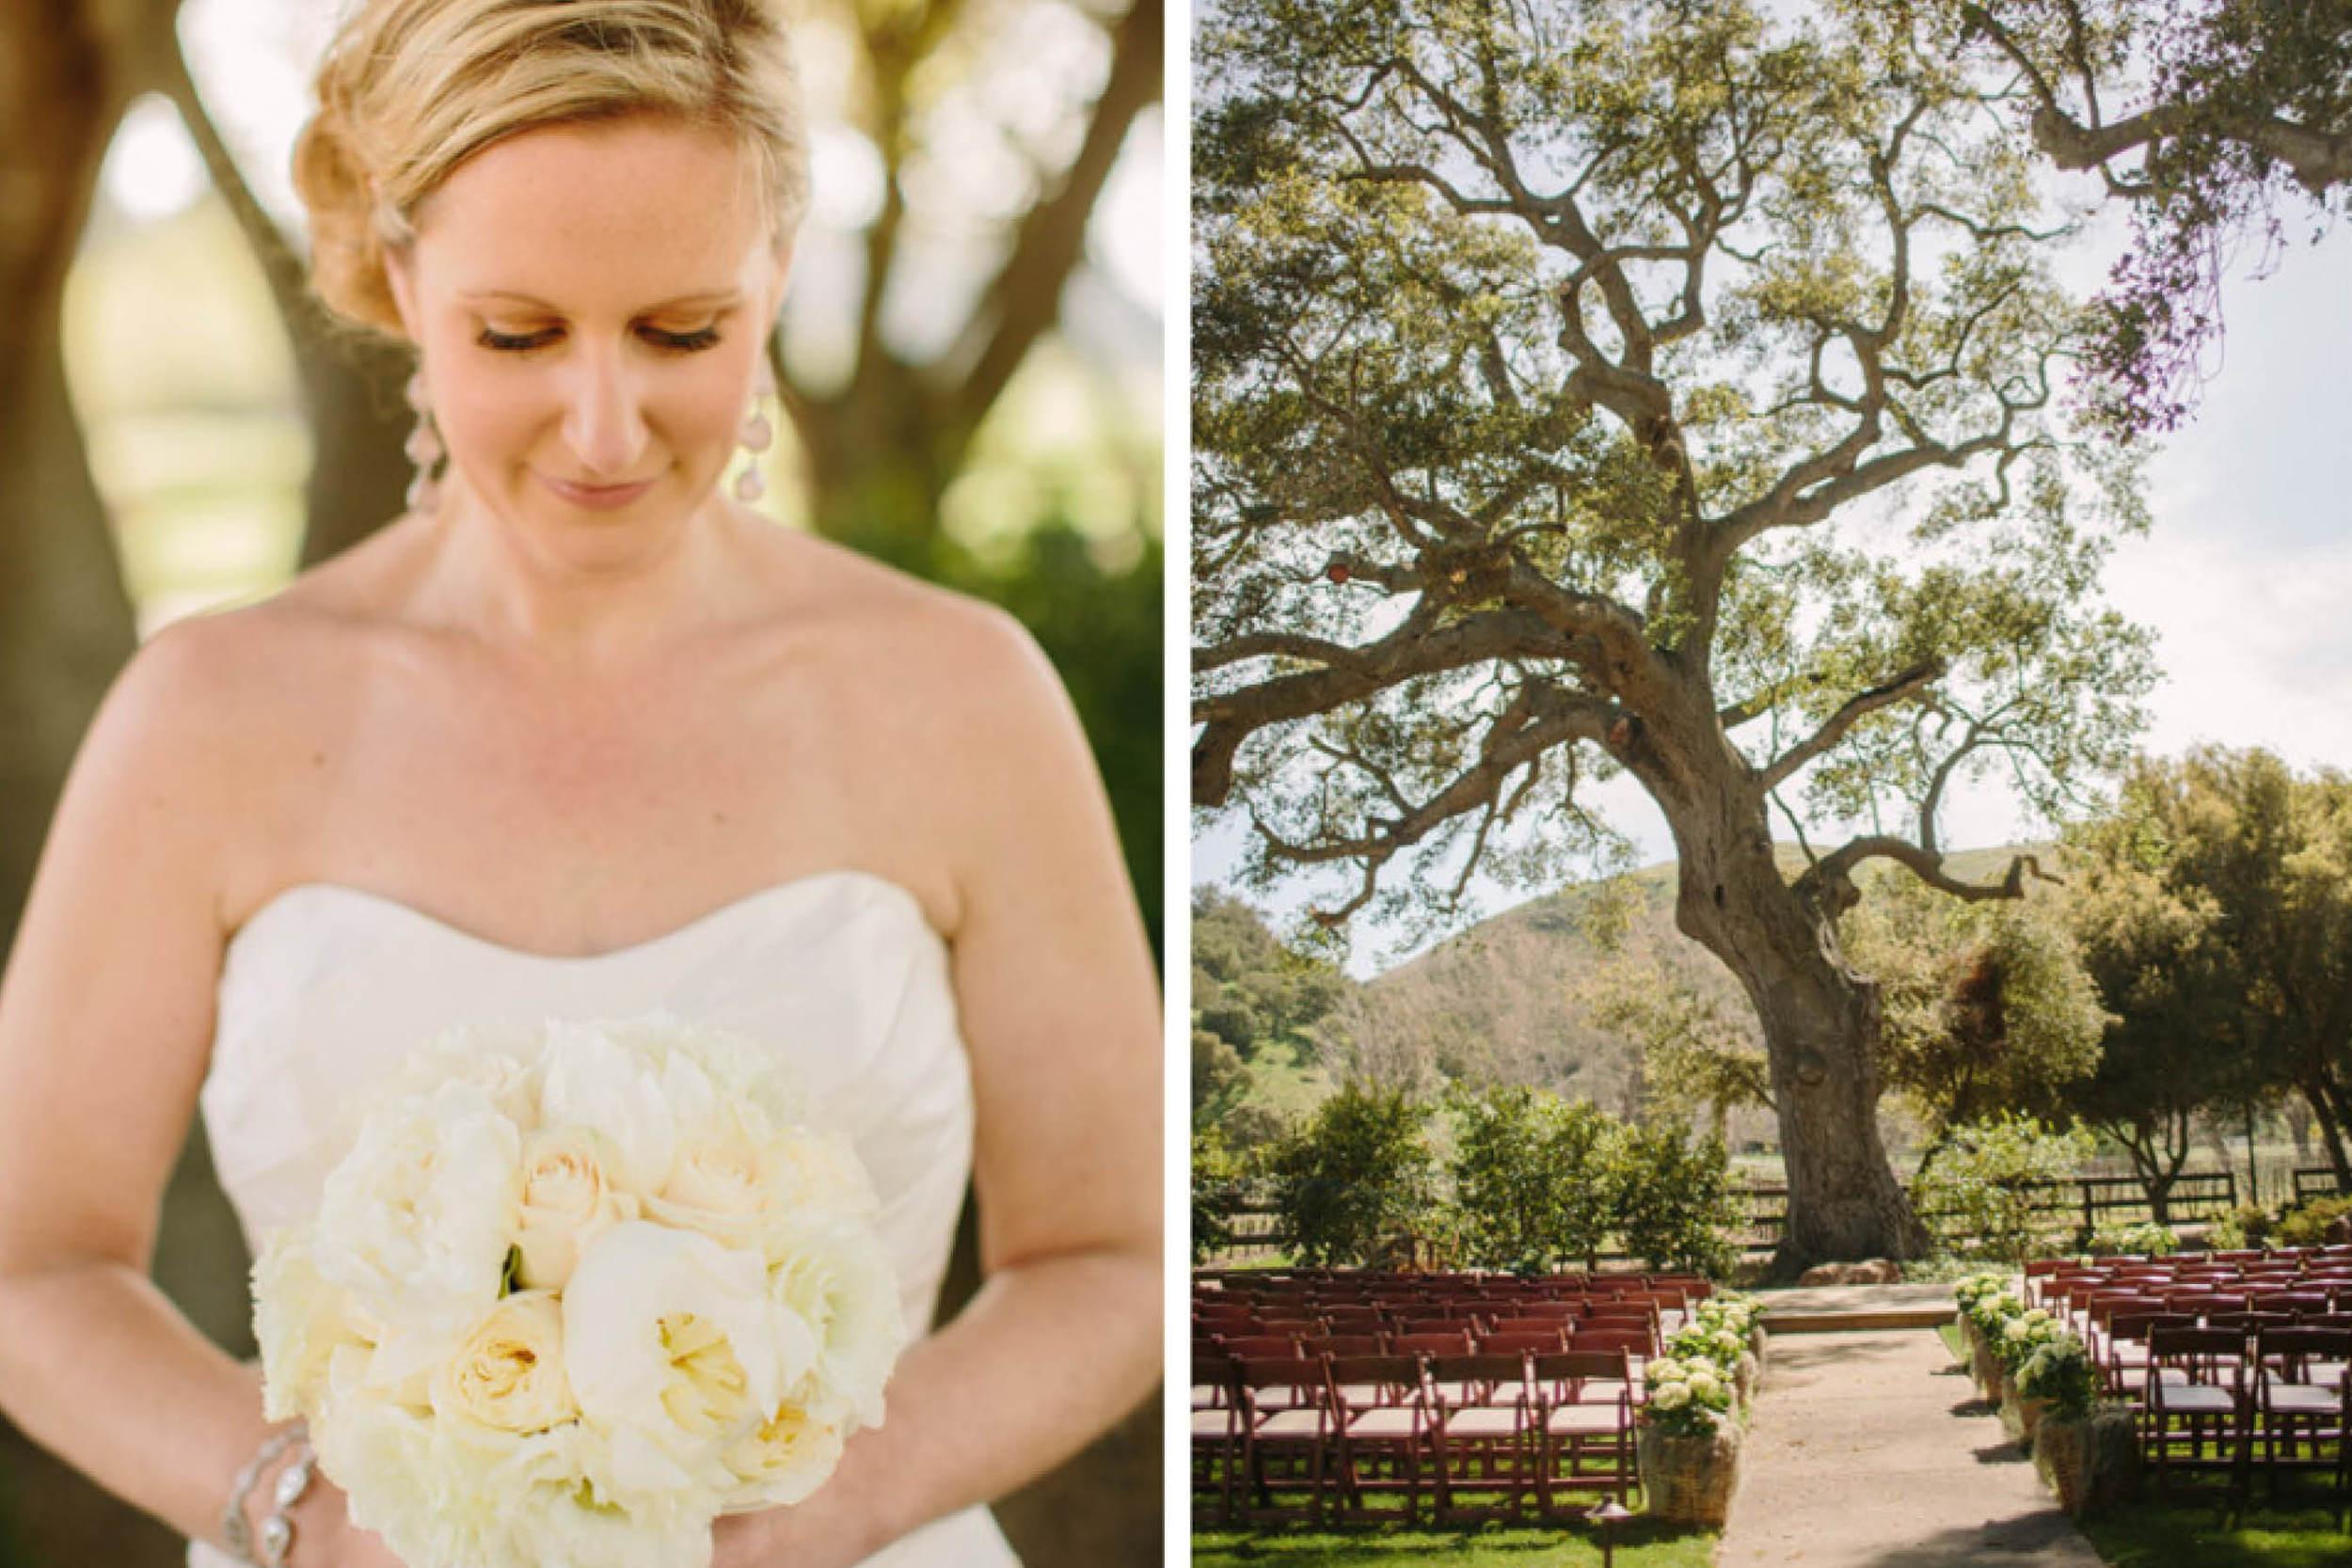 alegria-by-design-tres-hermanas-winery-vineyard-wedding-planner-coordinator-santa-barbara-ynez-maria (2).jpg